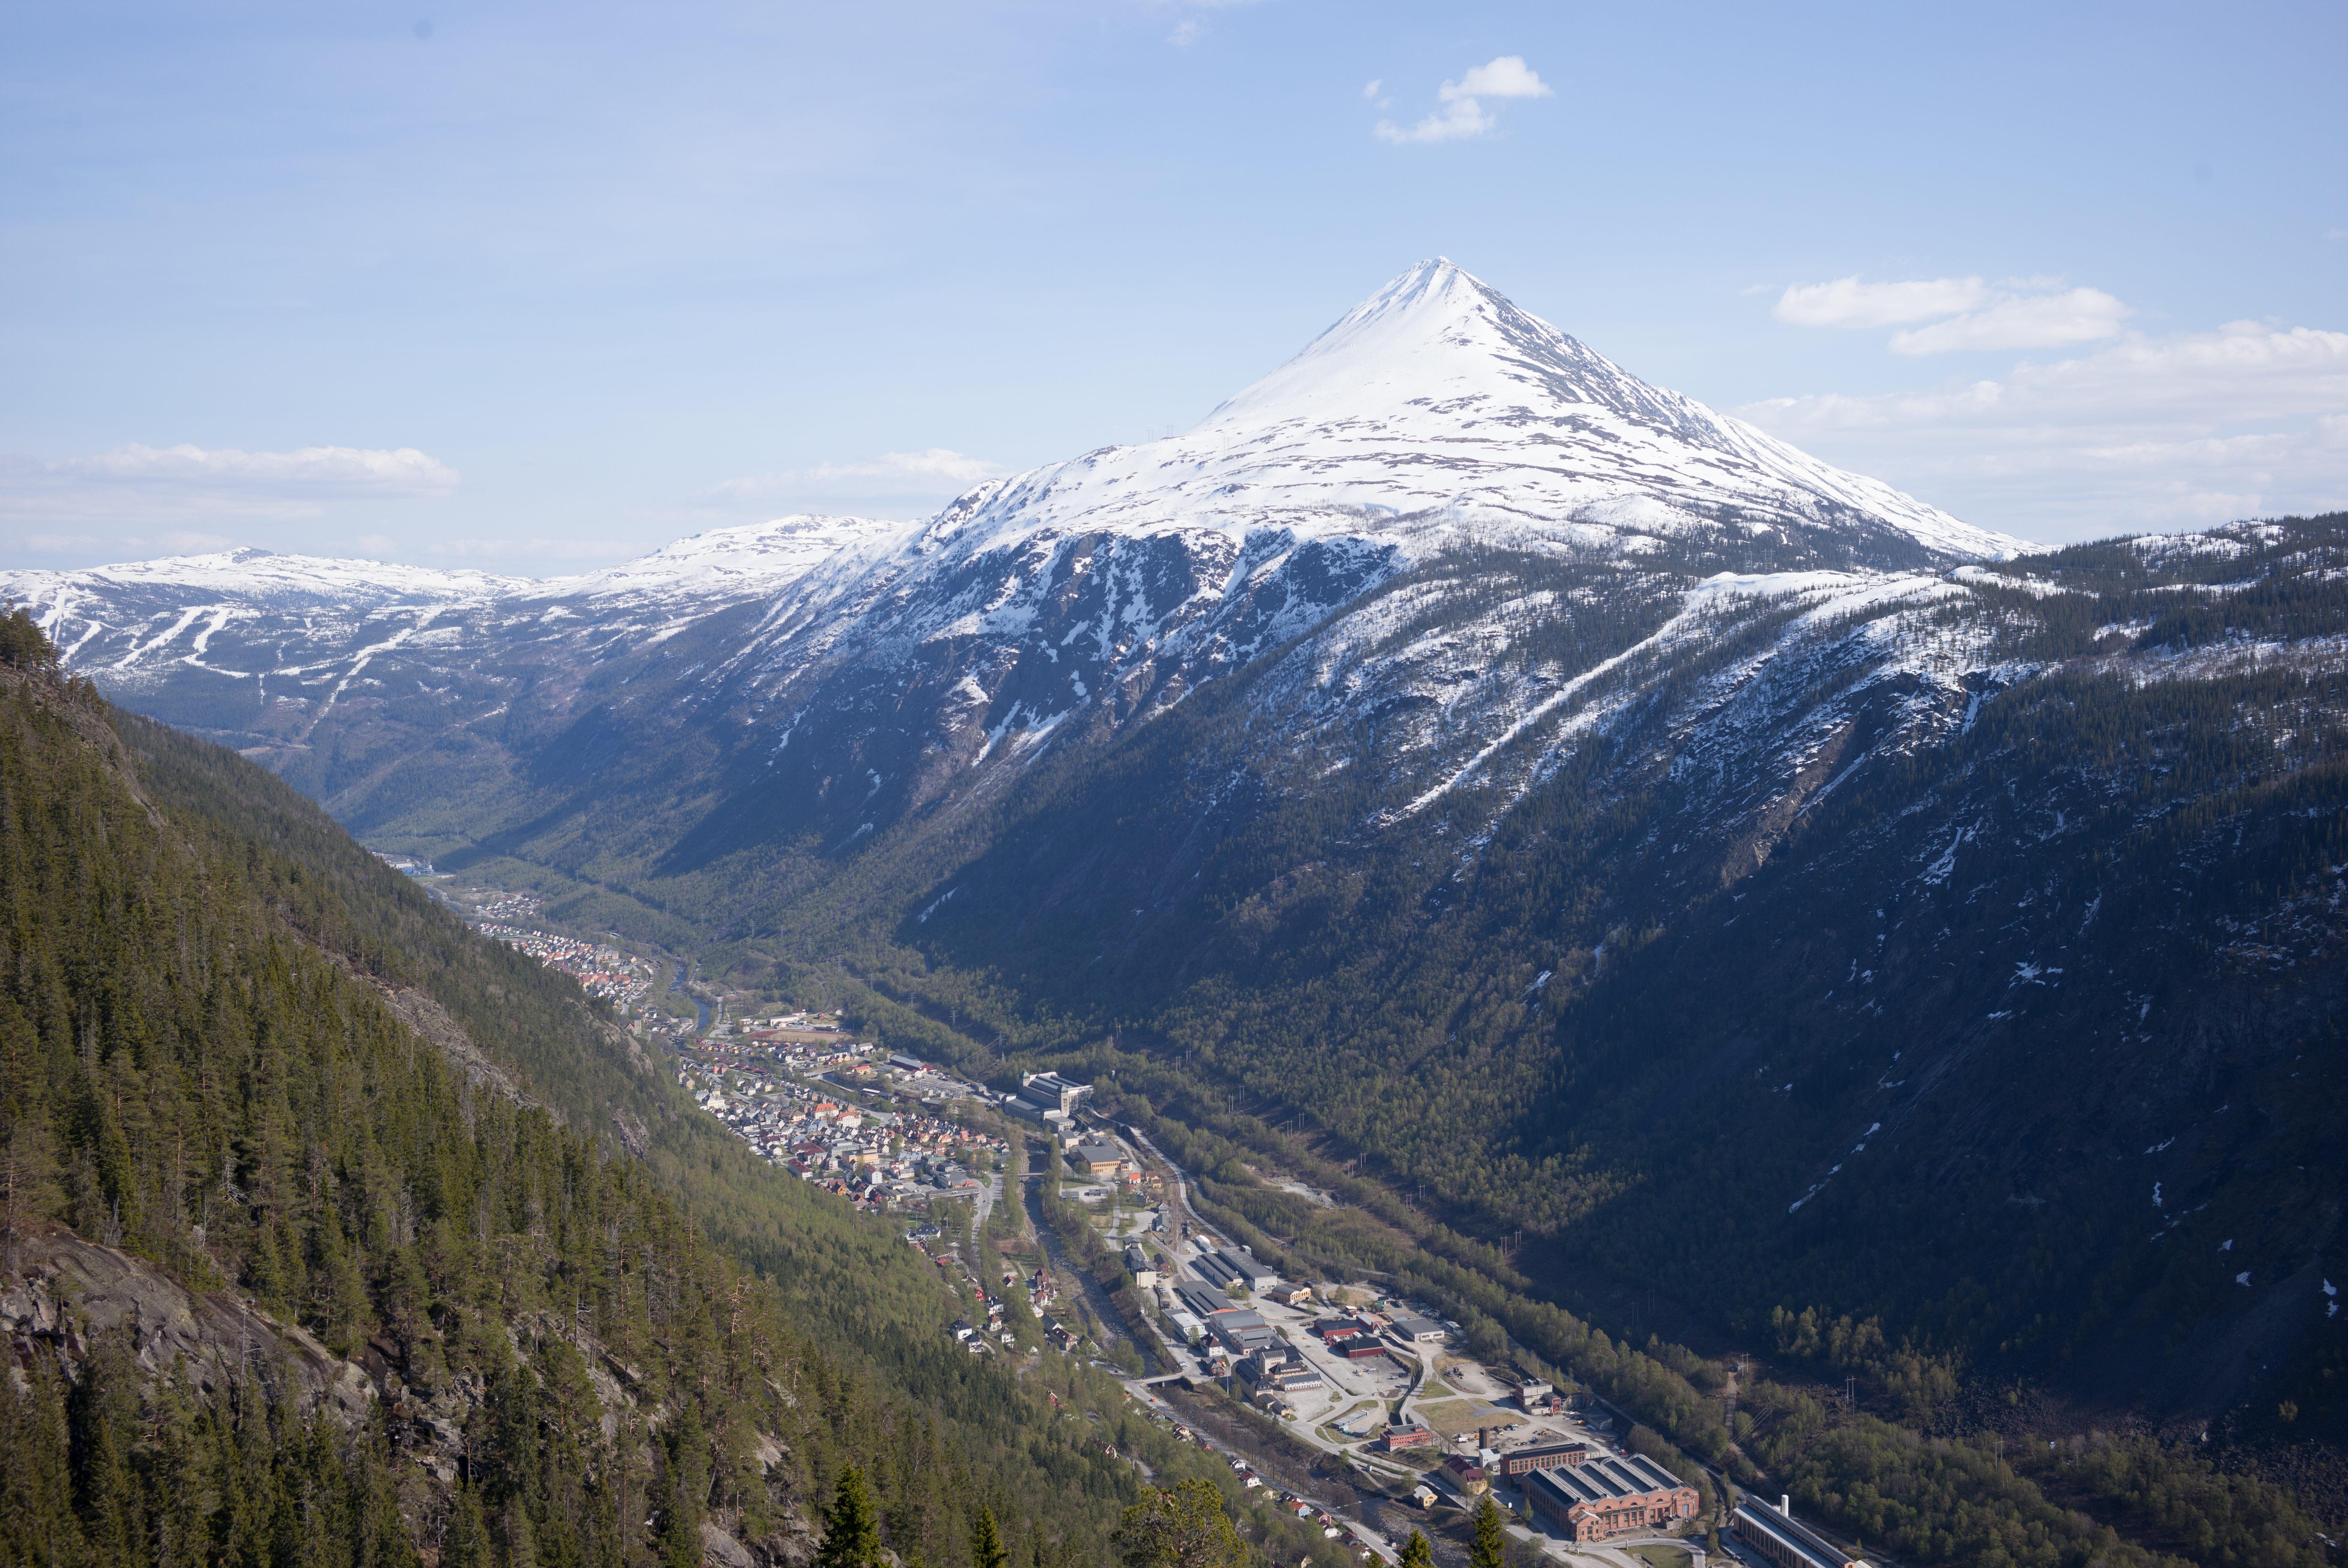 Gaustatoppen seen from Krossobanen